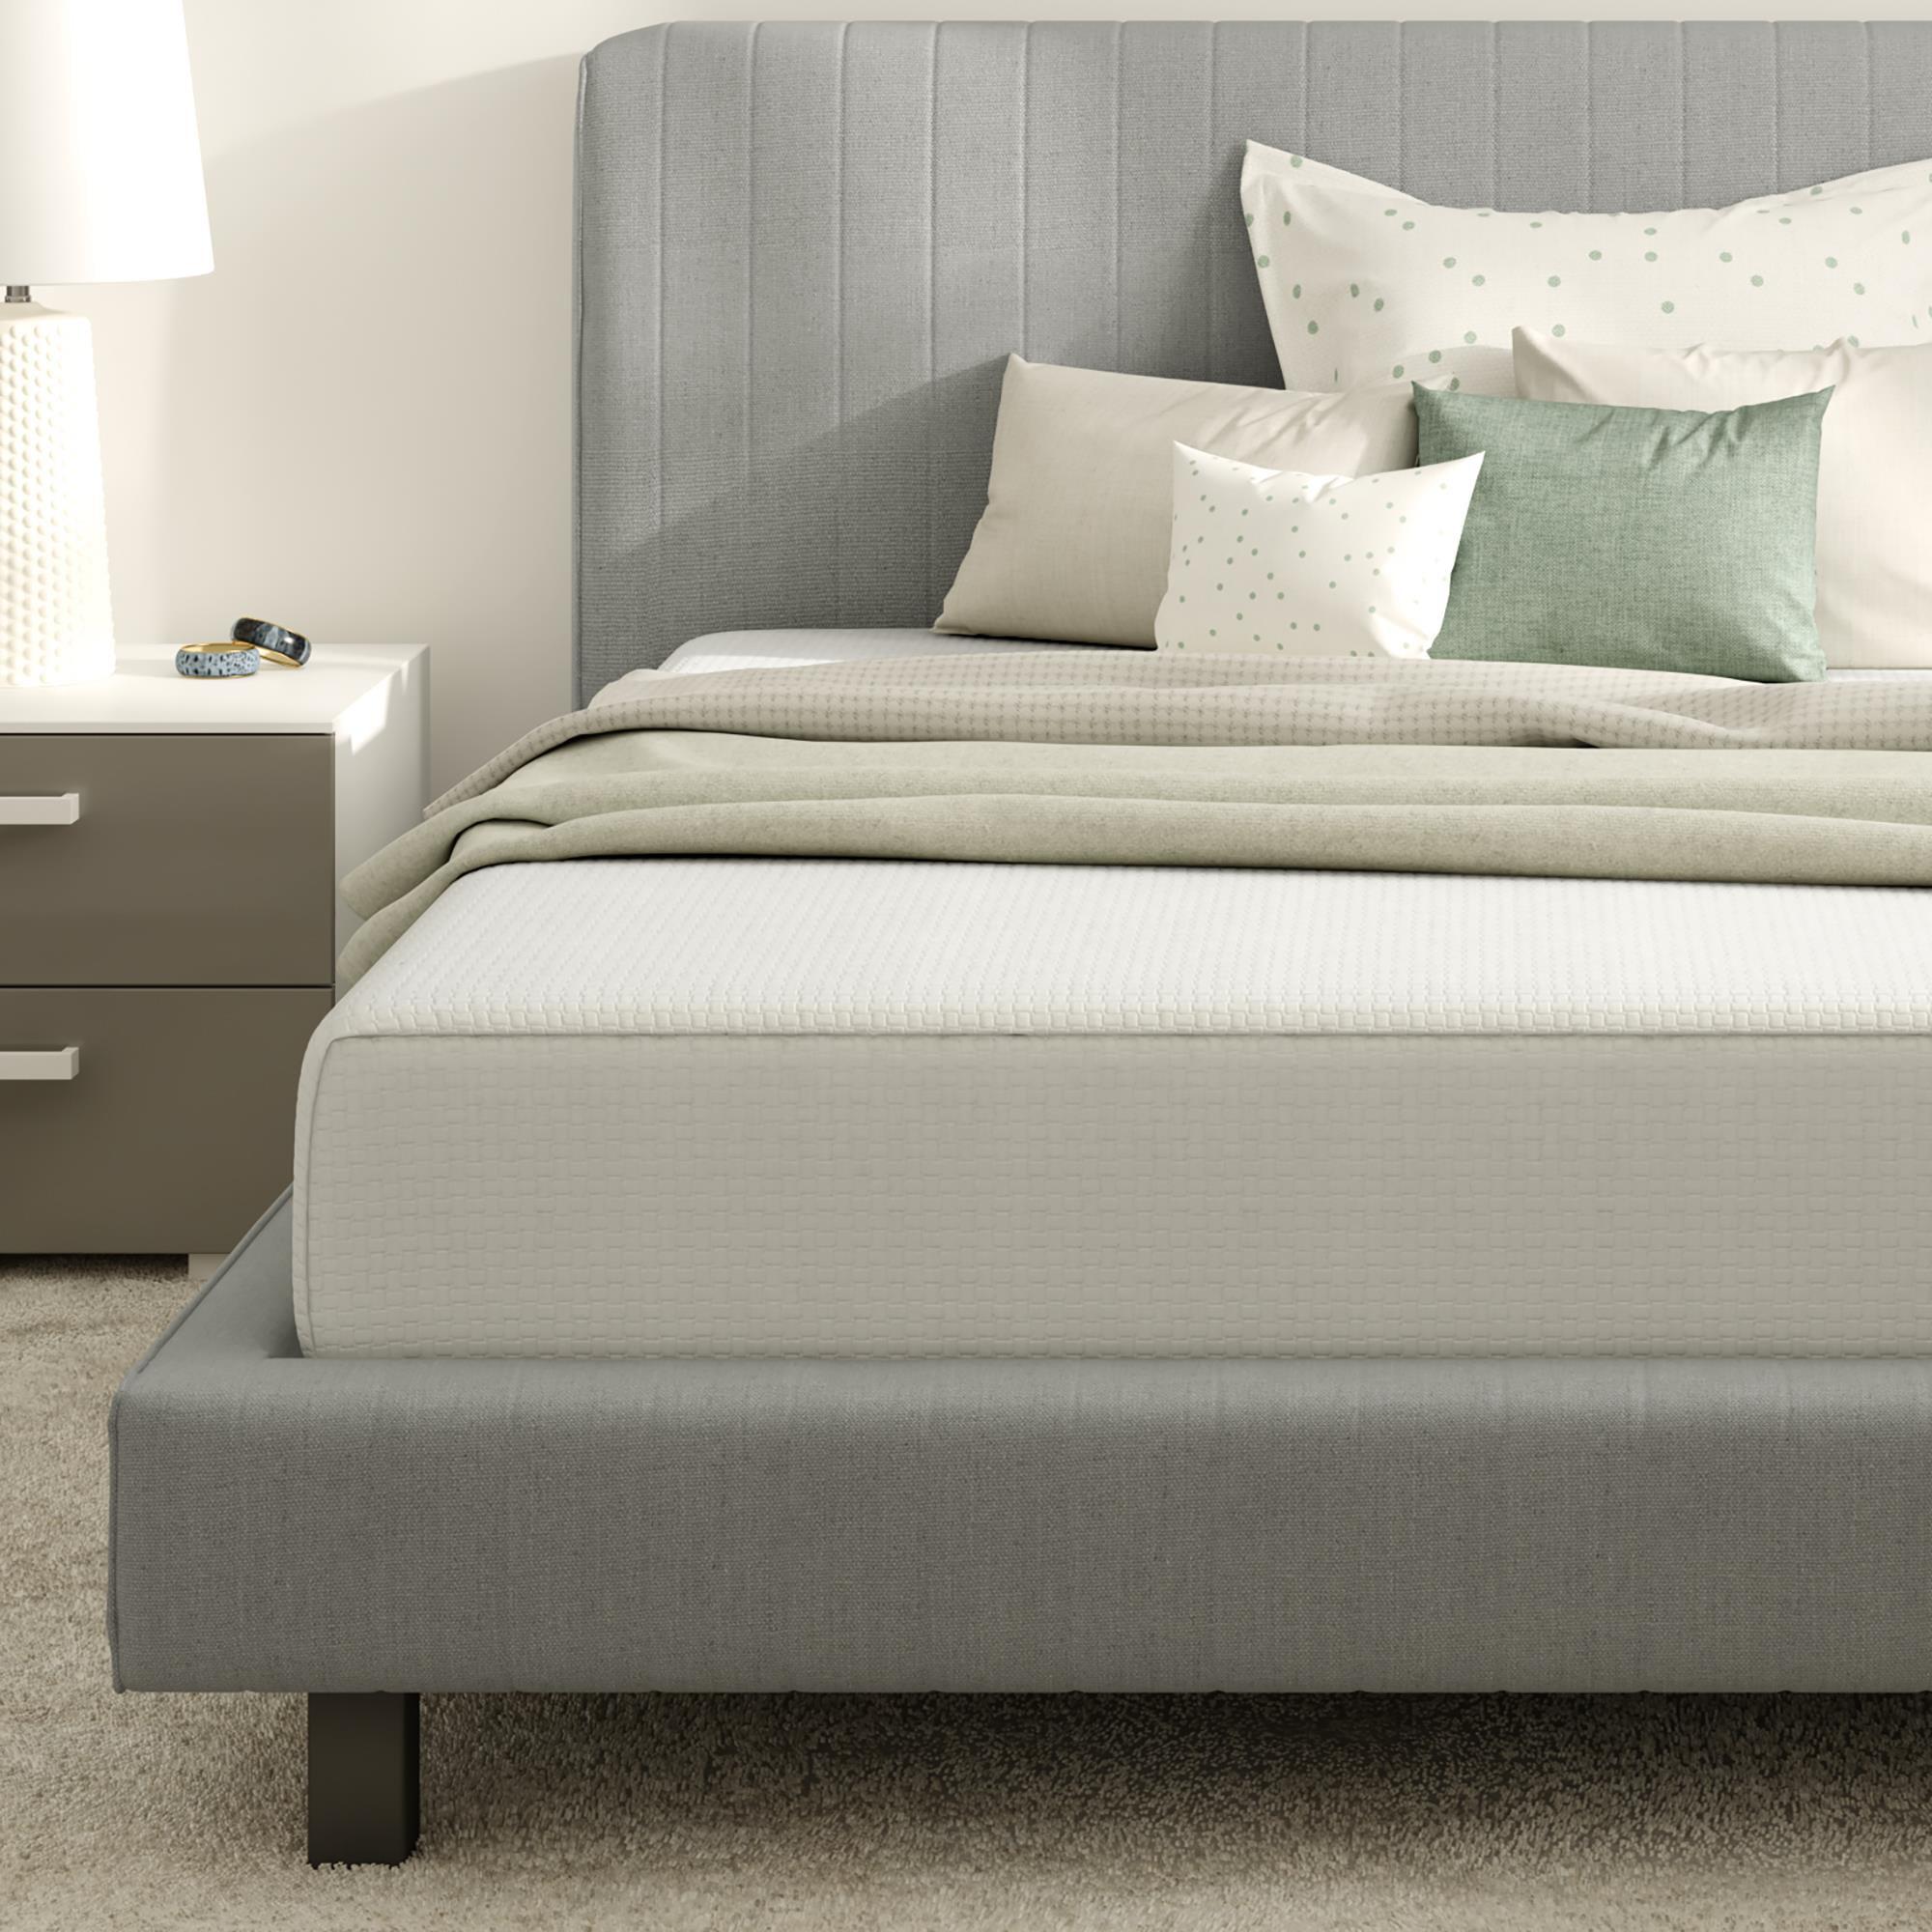 Signature Sleep Gold Certipur Us Inspire 10 Memory Foam Mattress